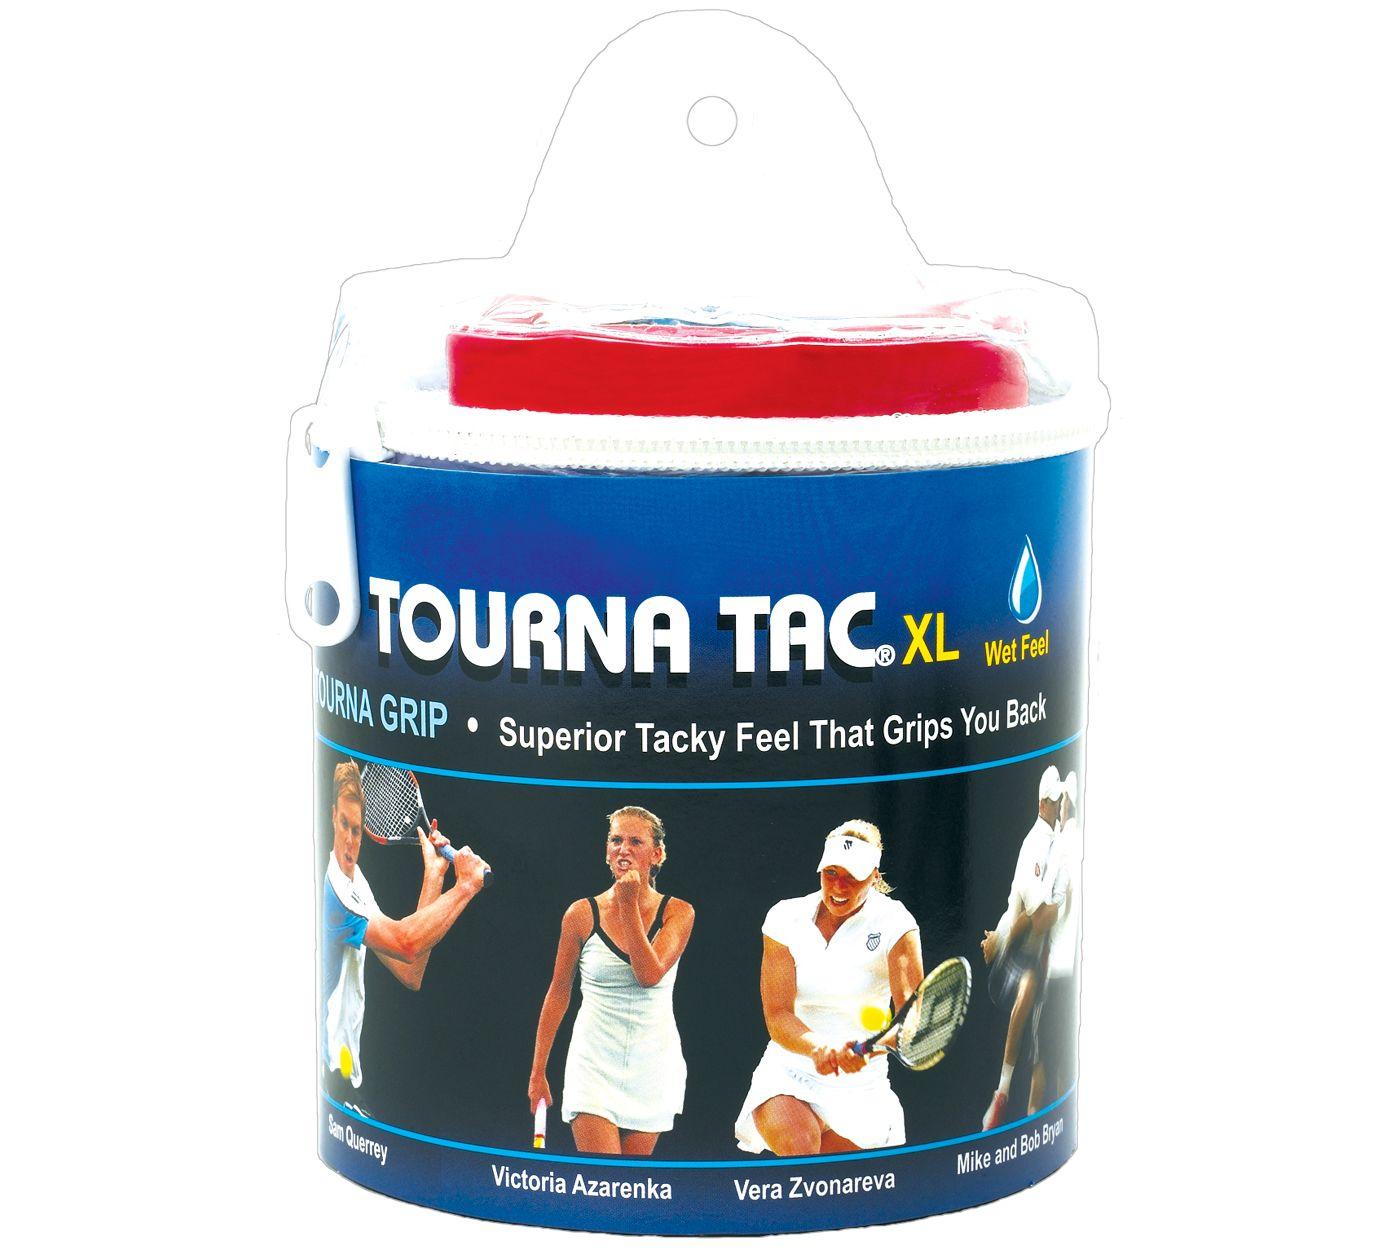 Tourna Tac XL Overgrip - 30 Pack